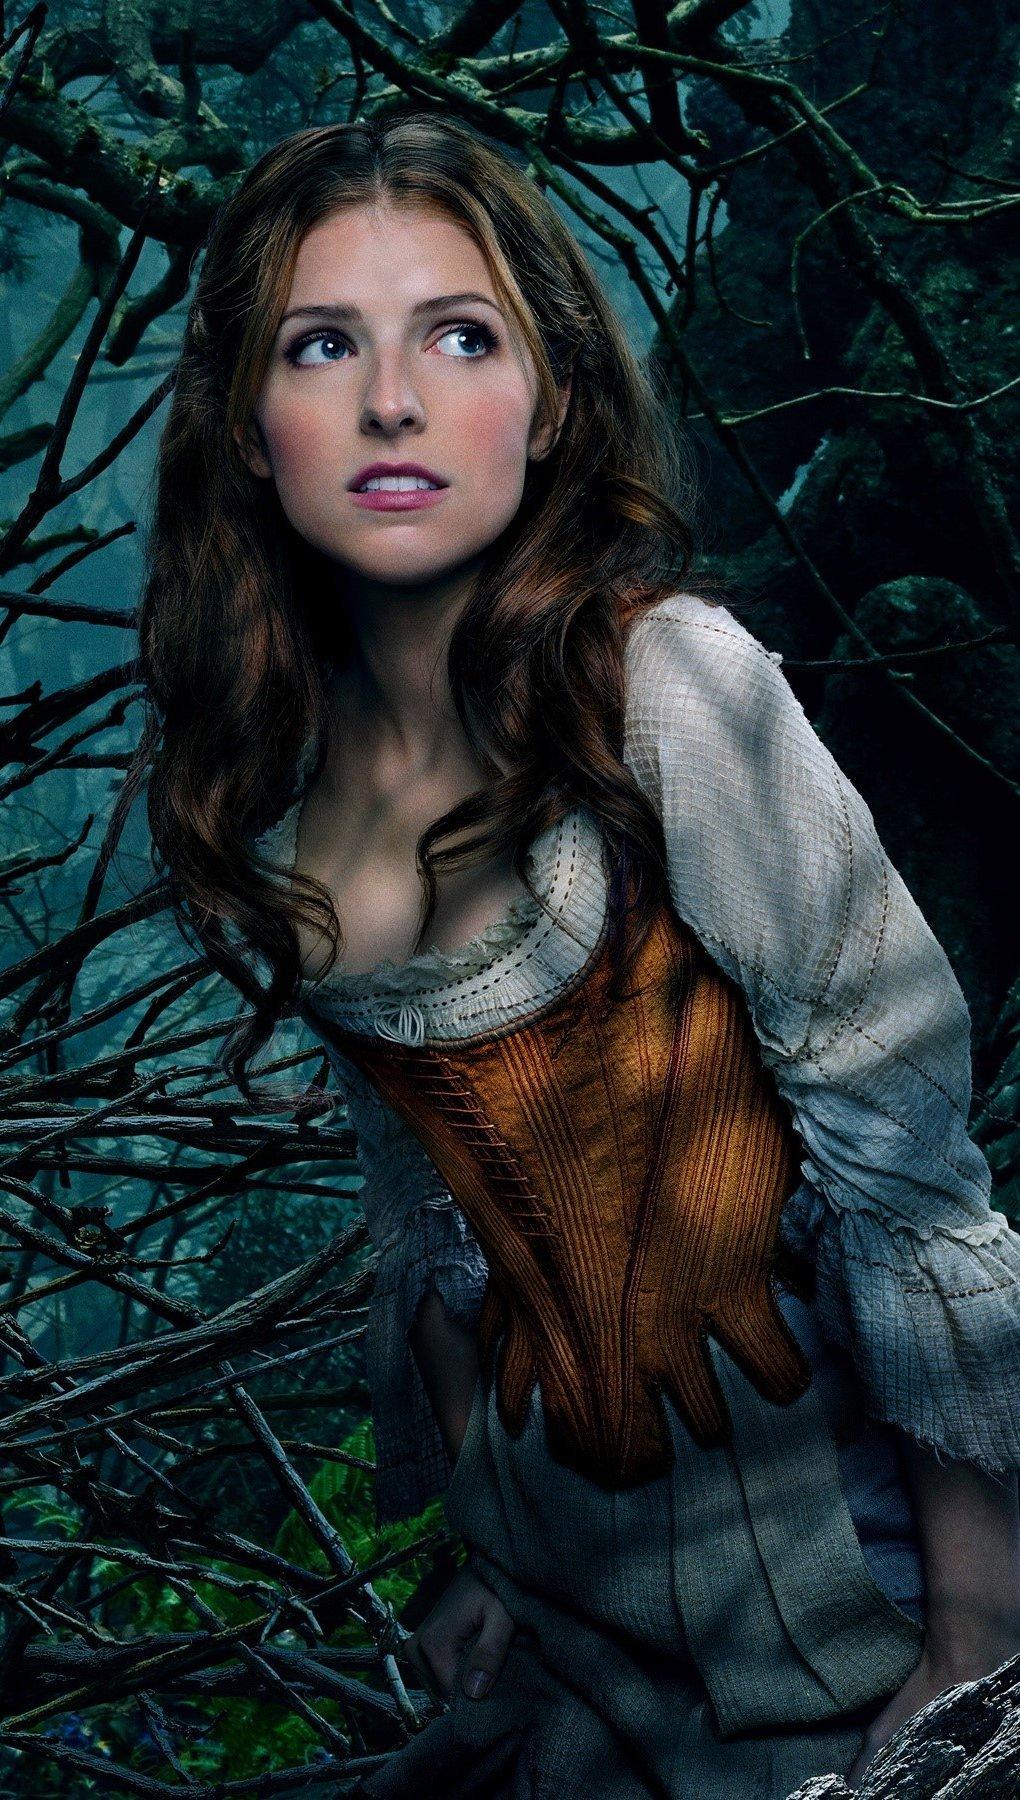 Wallpaper Anna kendrick as Cinderella Vertical